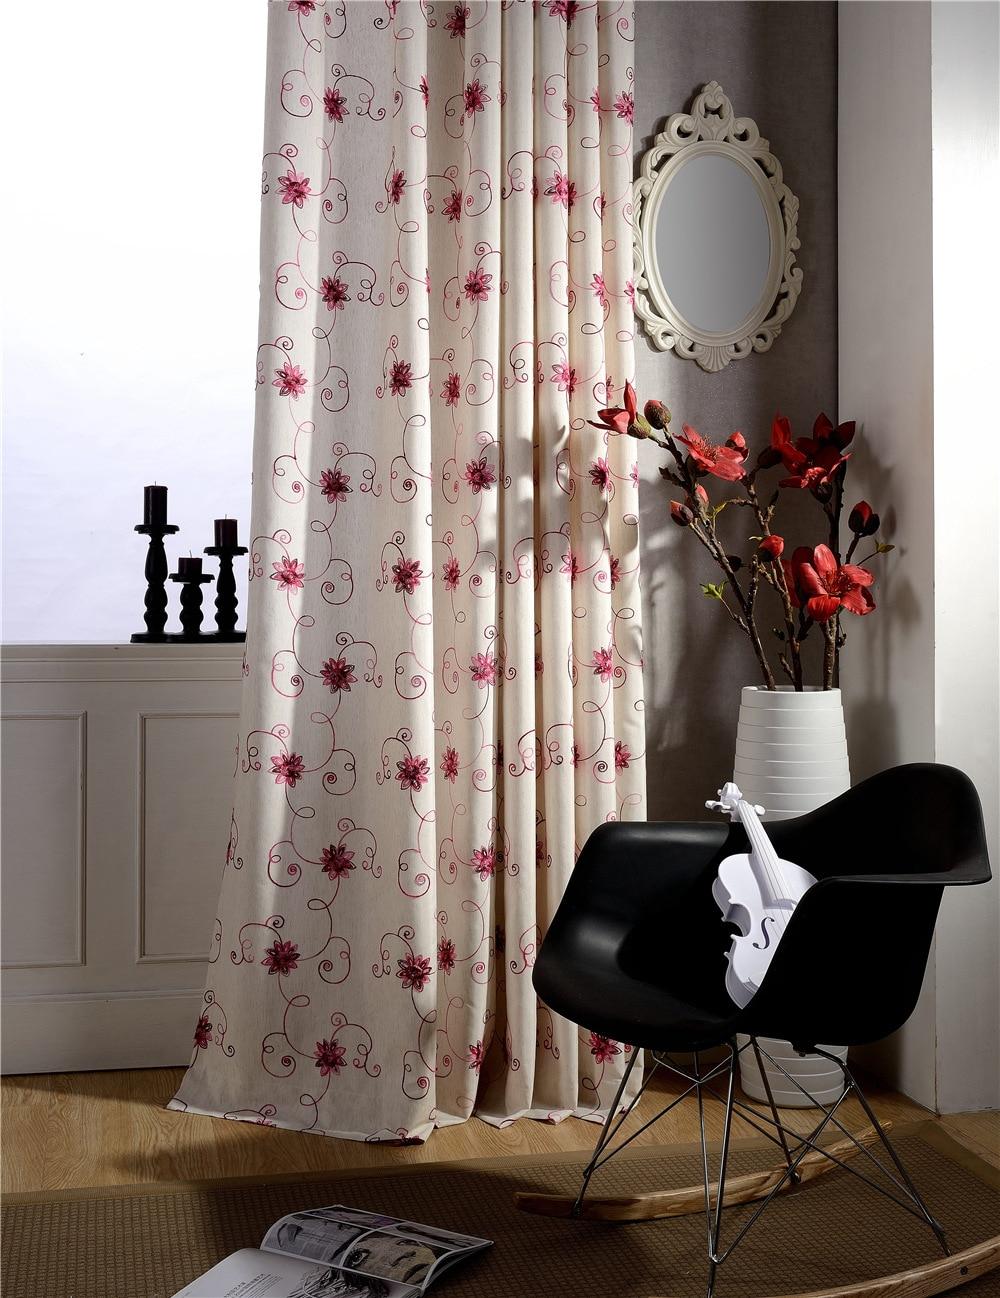 Red Embroidered Drapes Polyester cotton Fabrics Floral Curtains <font><b>Decoration</b></font> <font><b>home</b></font> Pastoral <font><b>Elegant</b></font> Living room curtains B16199-1